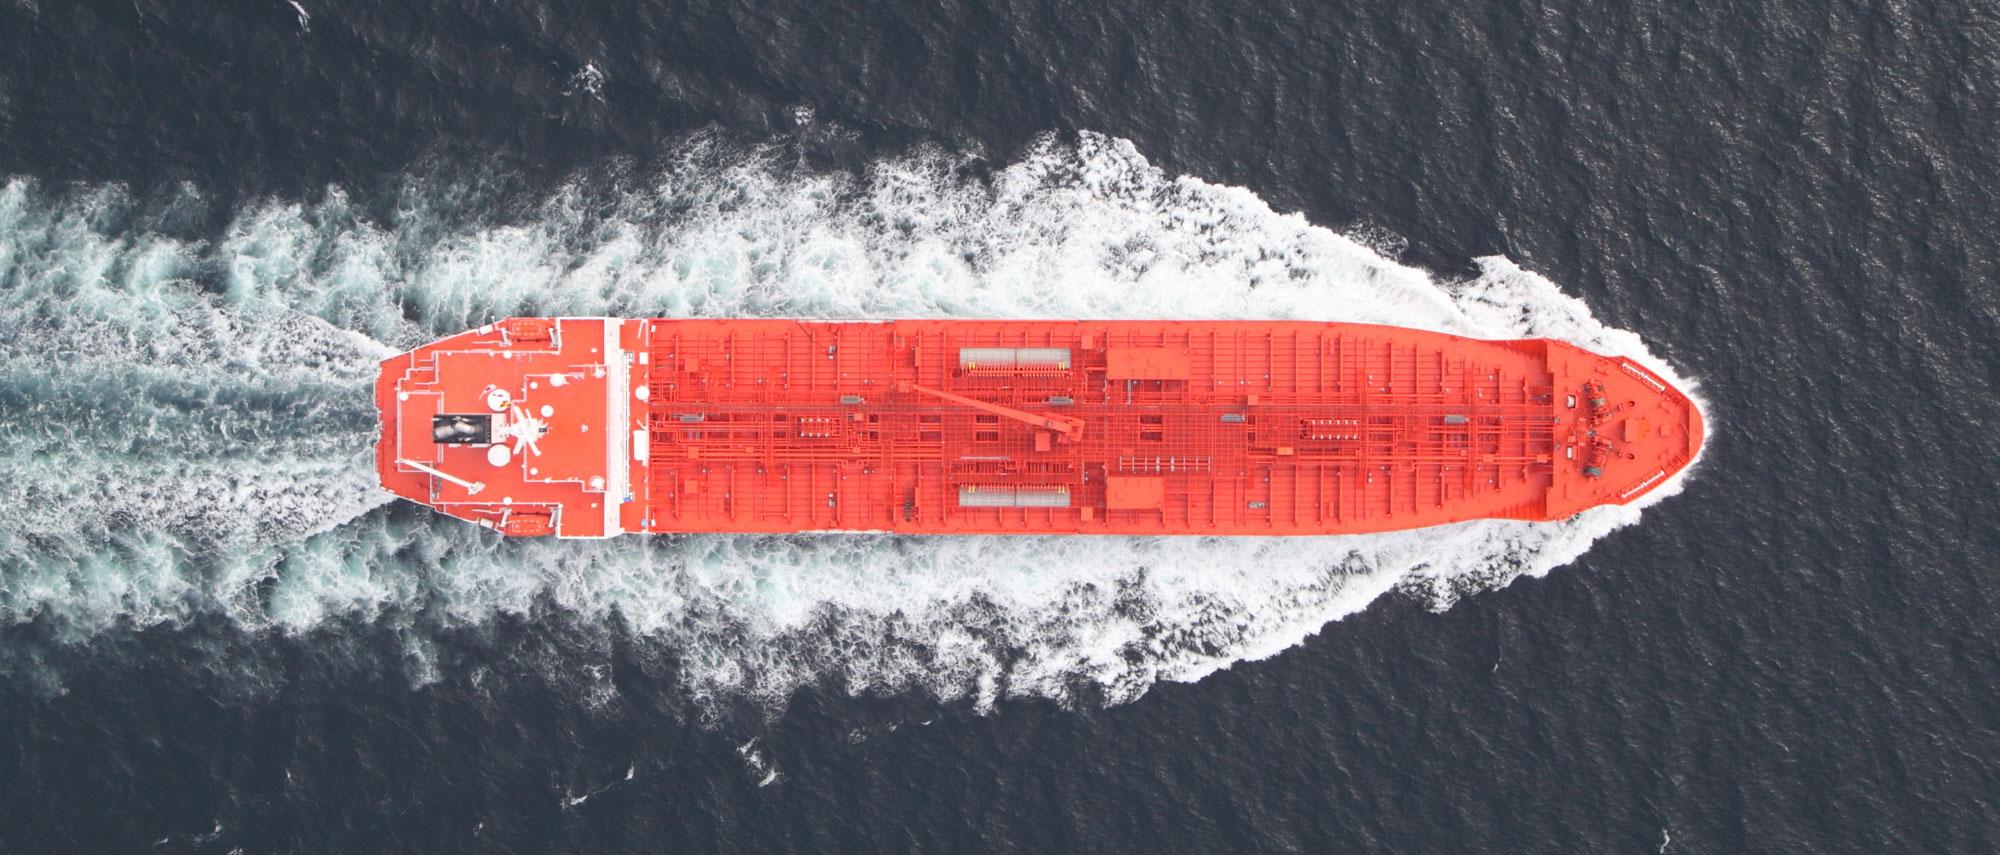 Ariel view of Cayman flagged merchant vessel